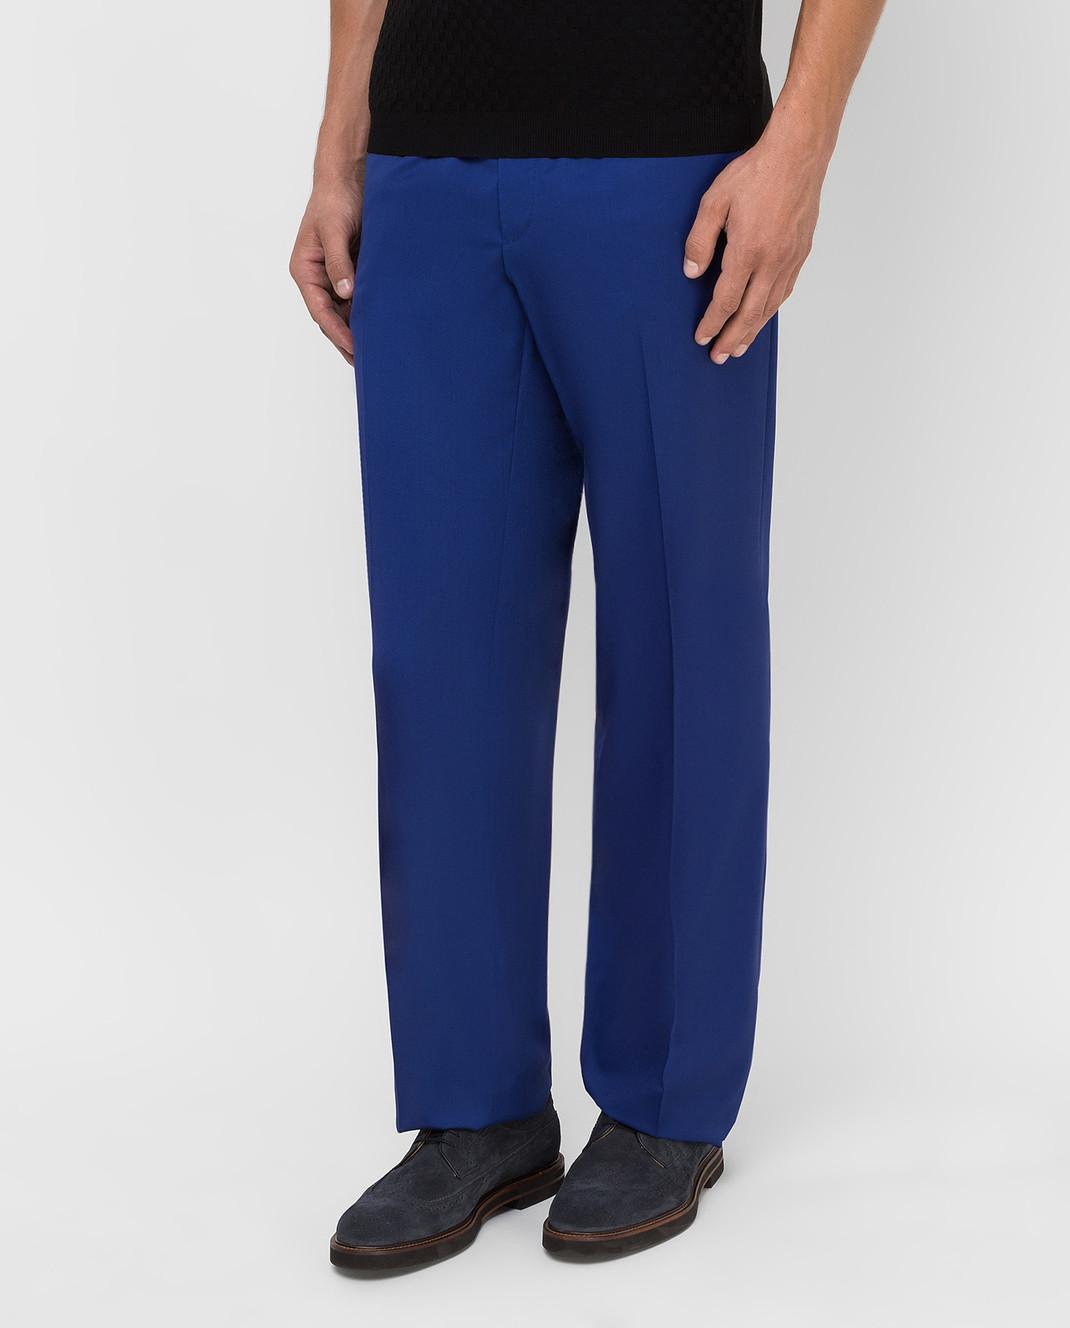 Castello d'Oro Синие брюки из шерсти изображение 3